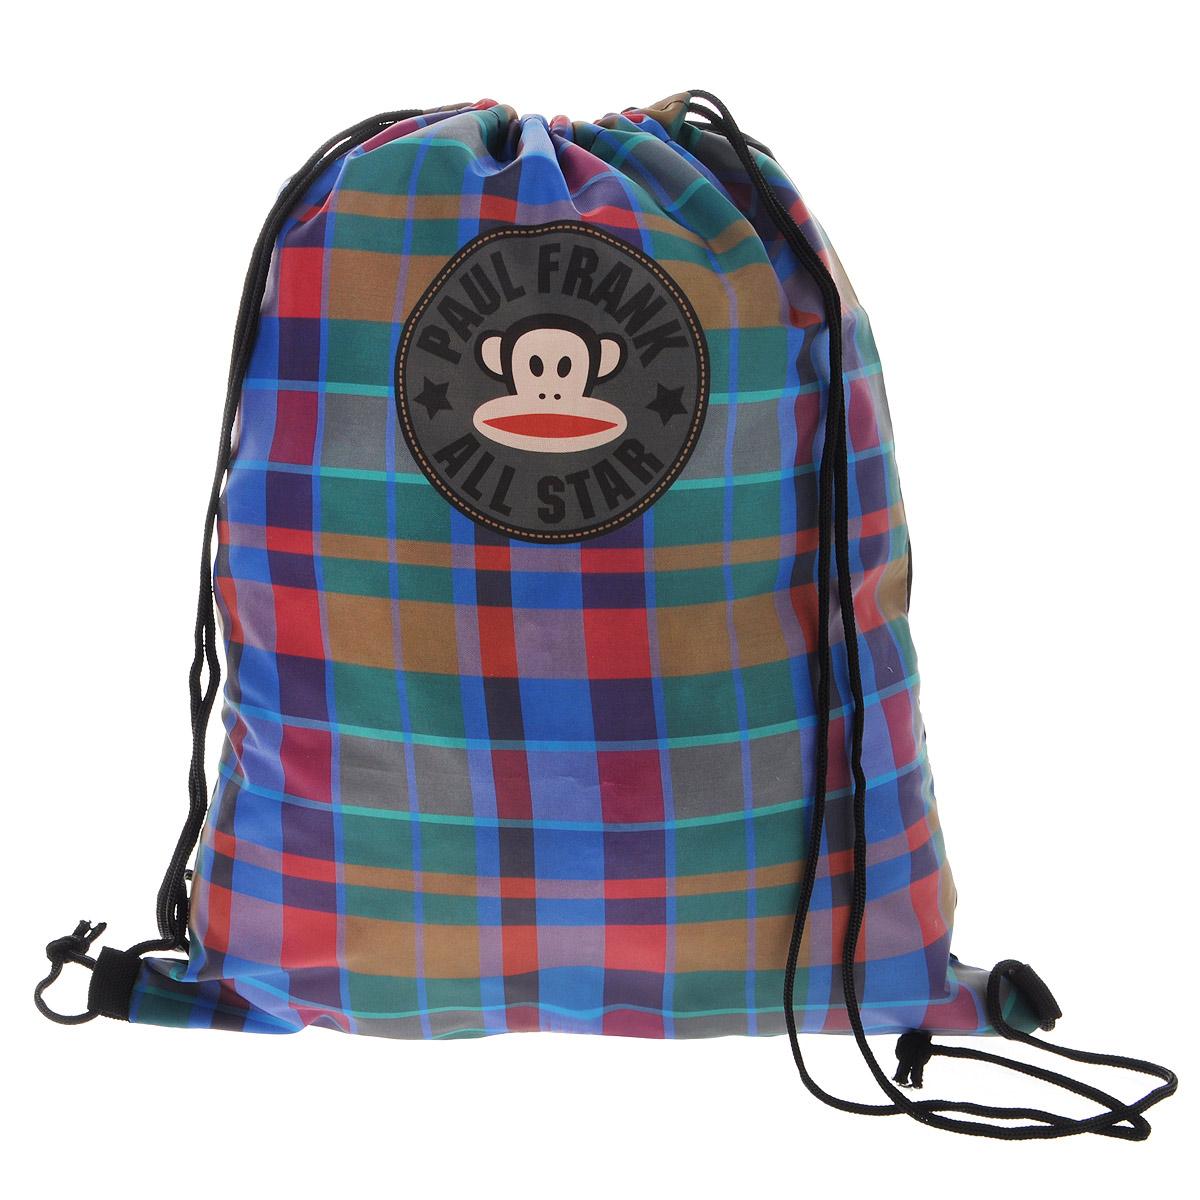 Paul Frank Сумка-рюкзак для обуви цвет коричнево-красный PFCB-UT1-883 толстовка paul frank pftt143808m lili 14